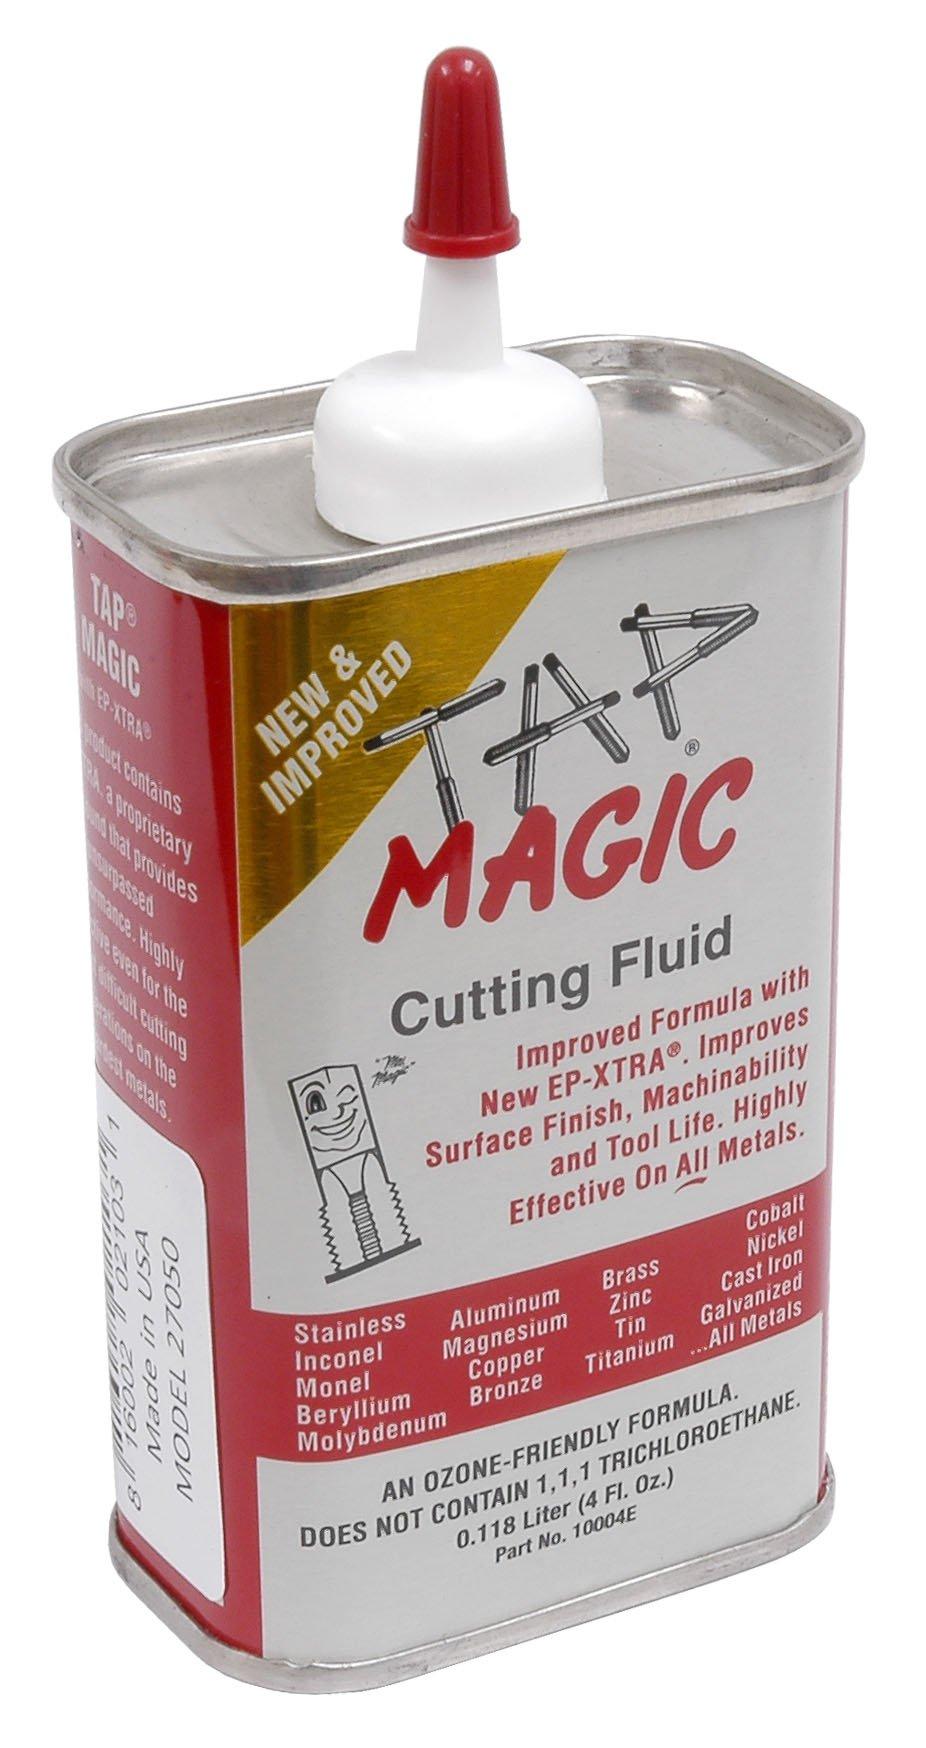 Hot Max 27050 Tap Magic Cutting Fluid, 4